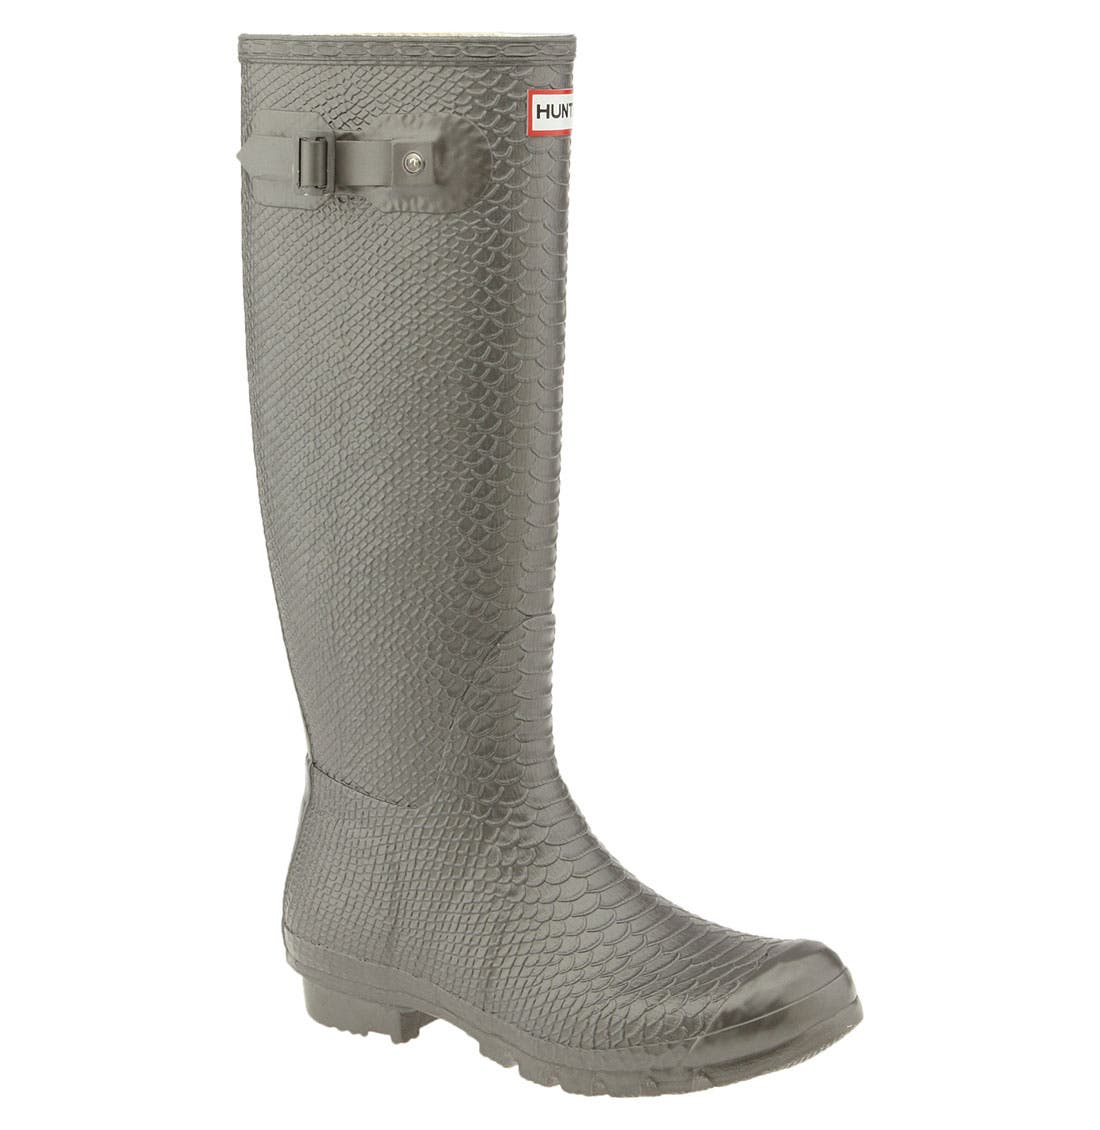 Main Image - Hunter 'Boa Tall' Rain Boot